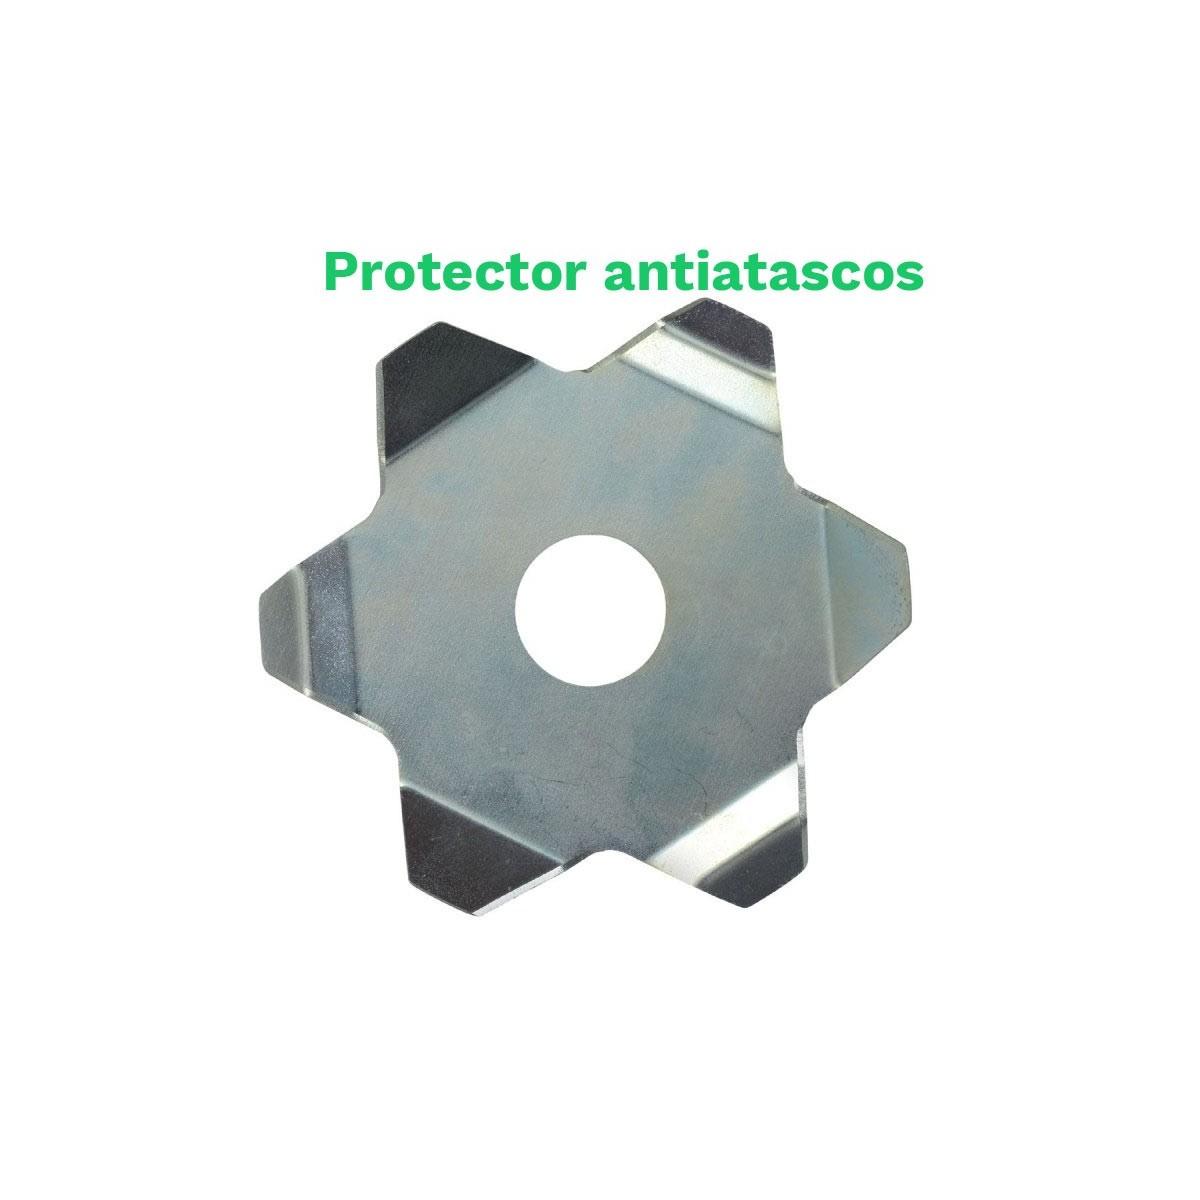 Echo disco protector antiatascos